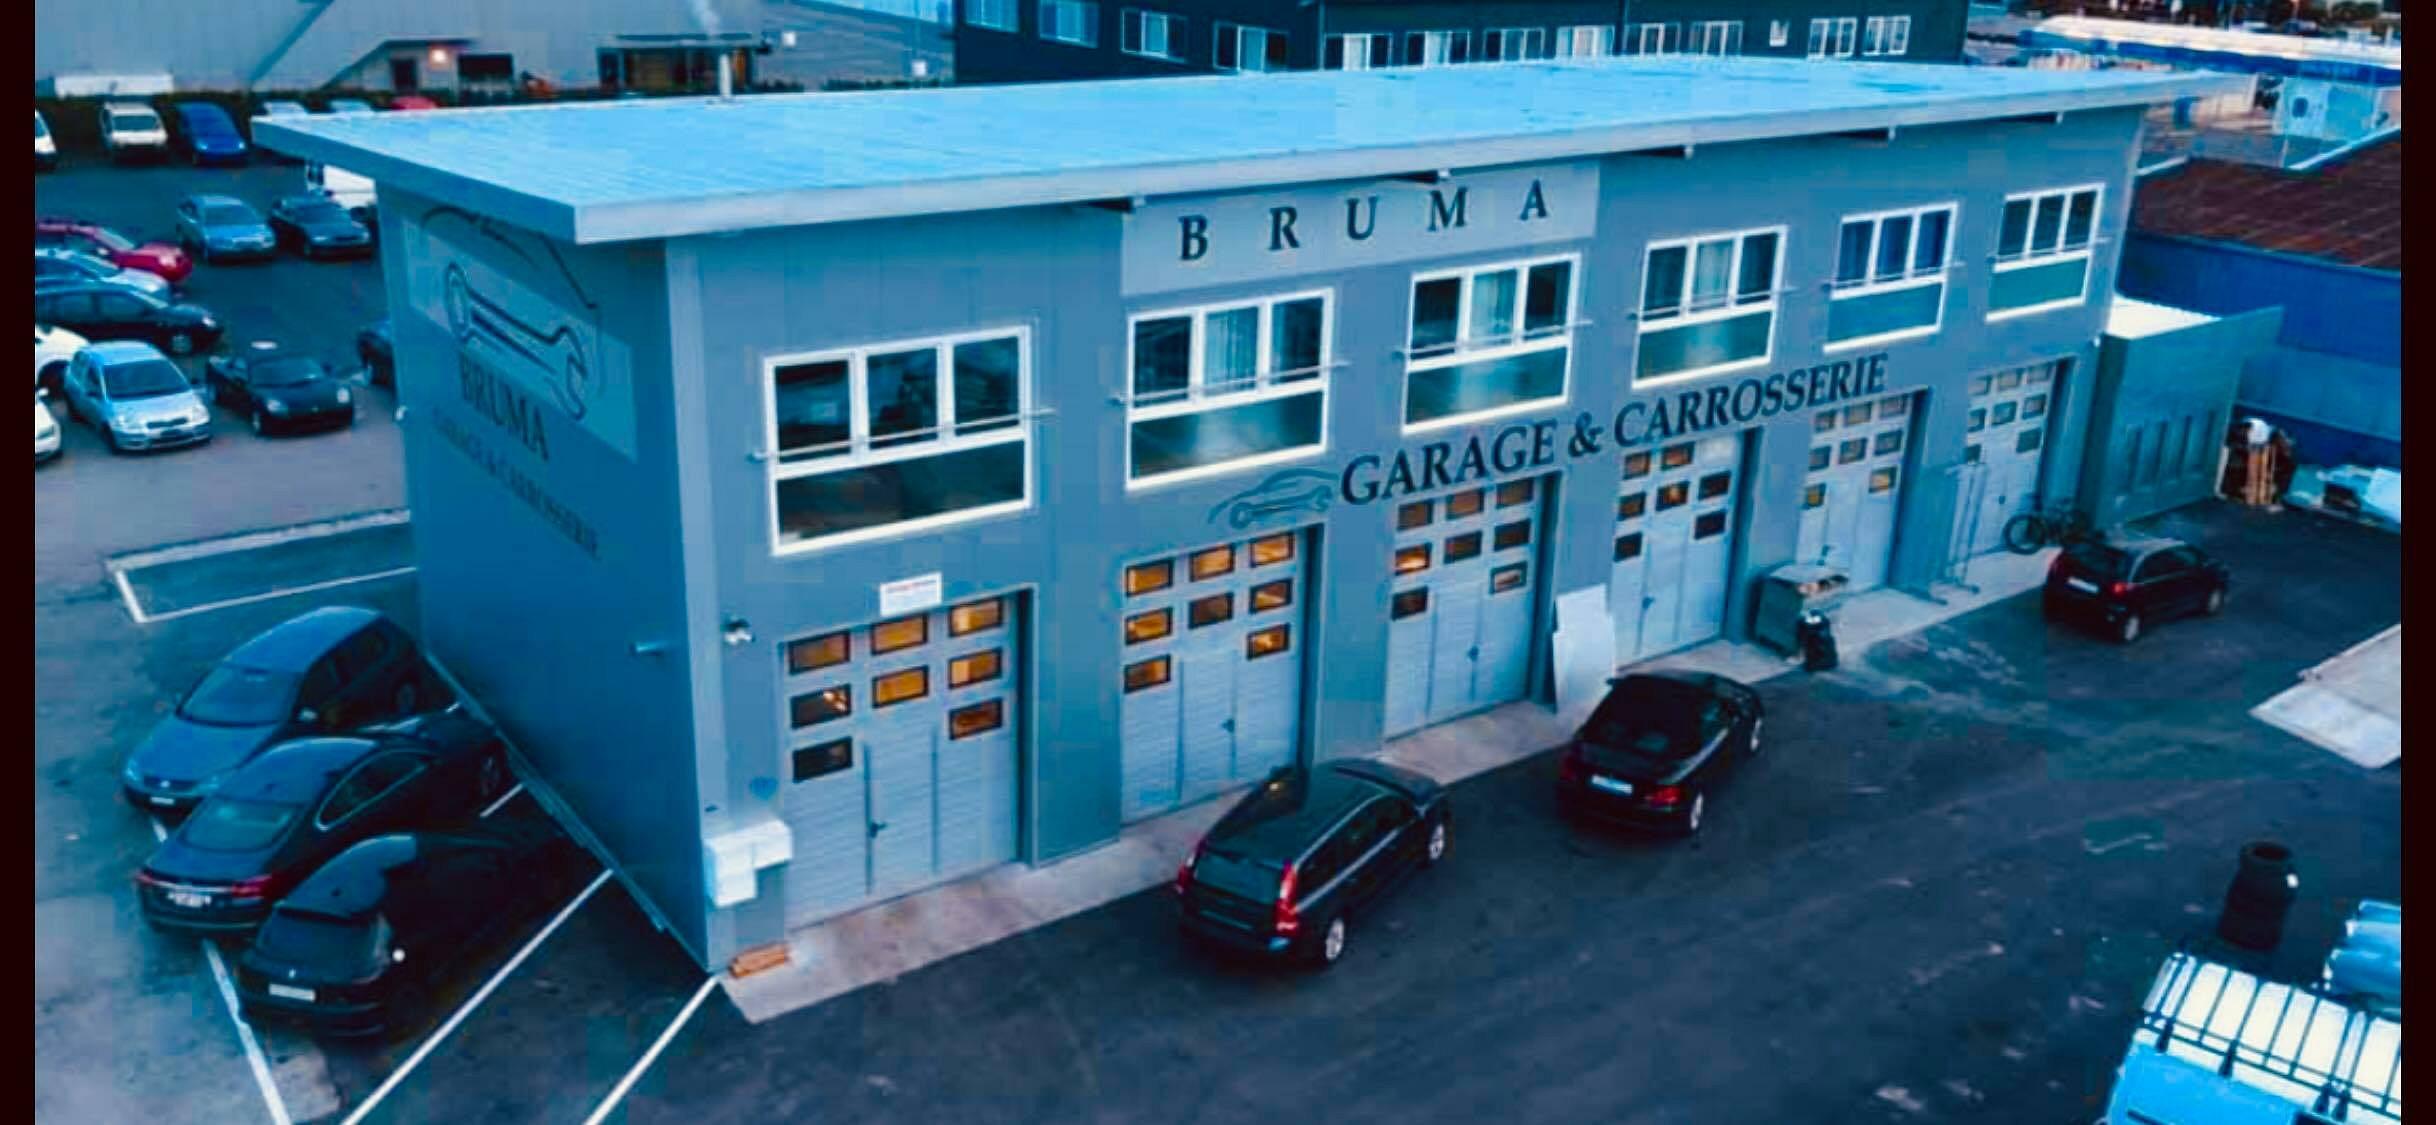 Garage Bruma